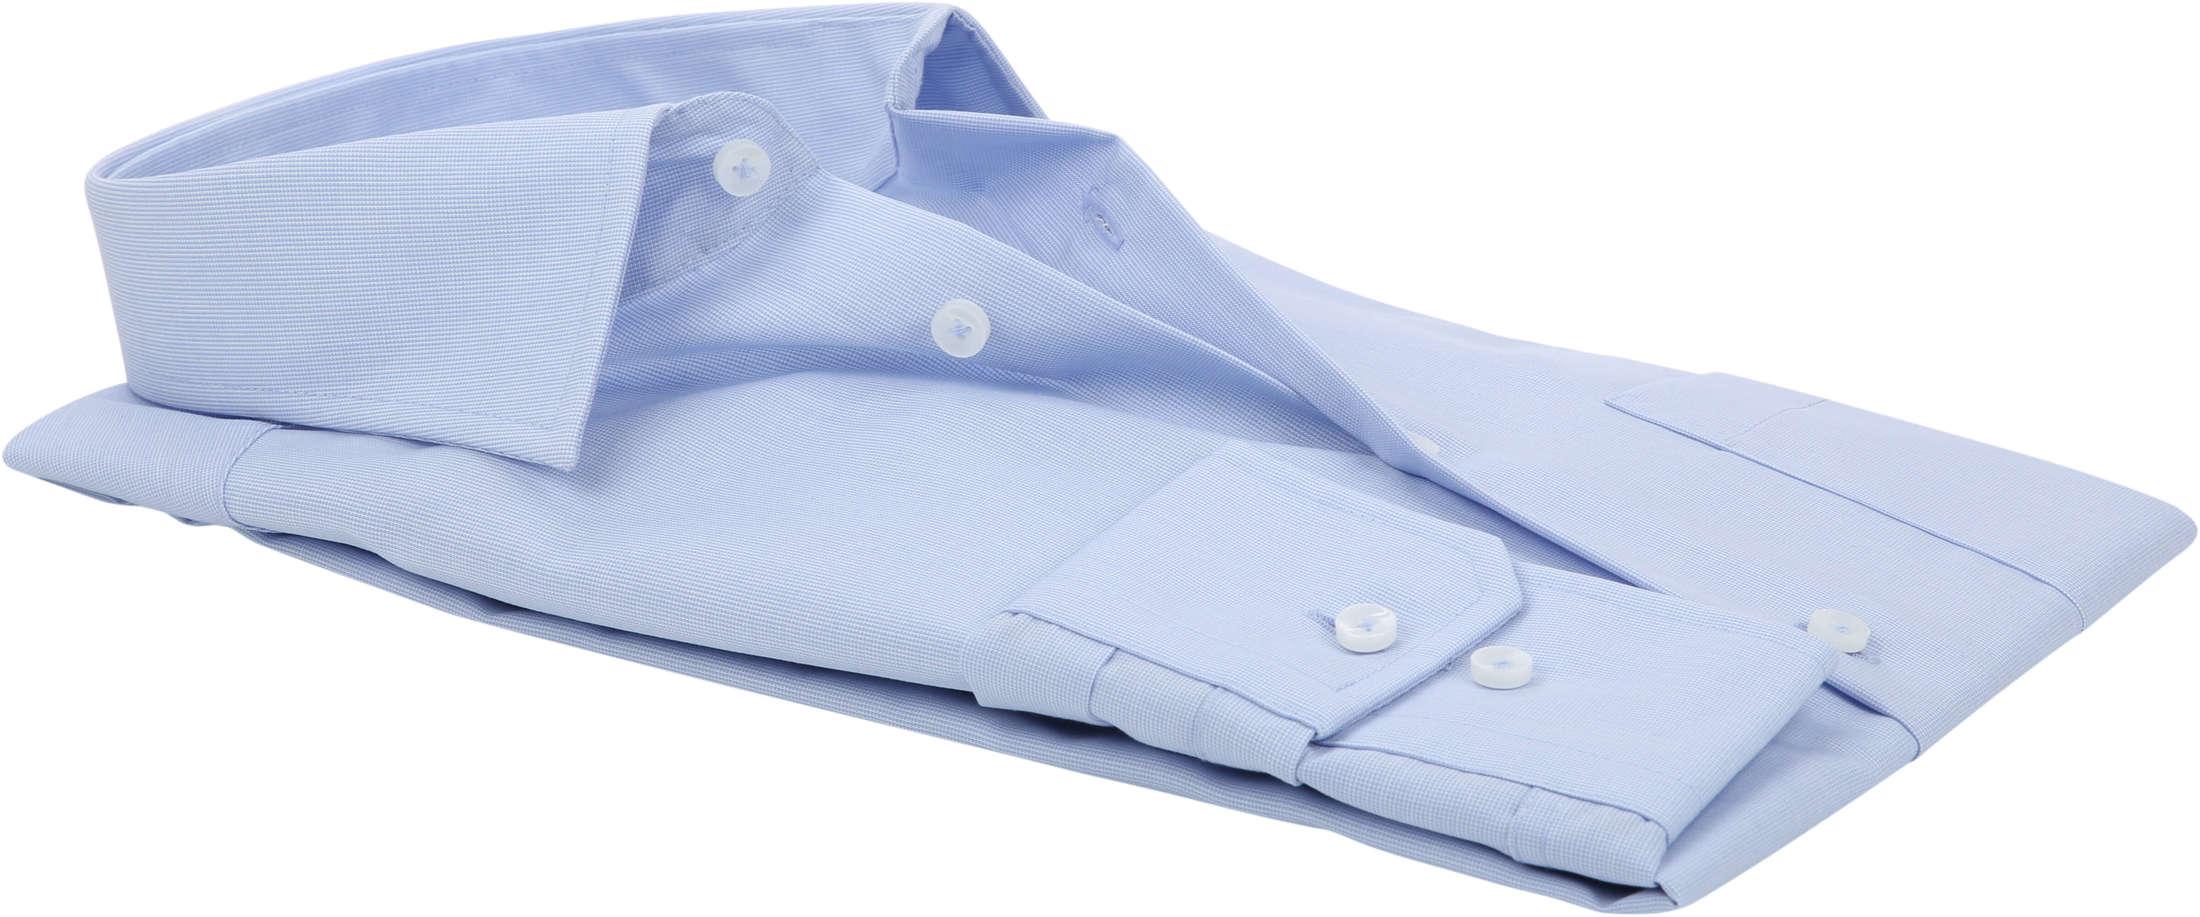 Seidensticker Hemd Modern Bügelfrei Himmelblau foto 3